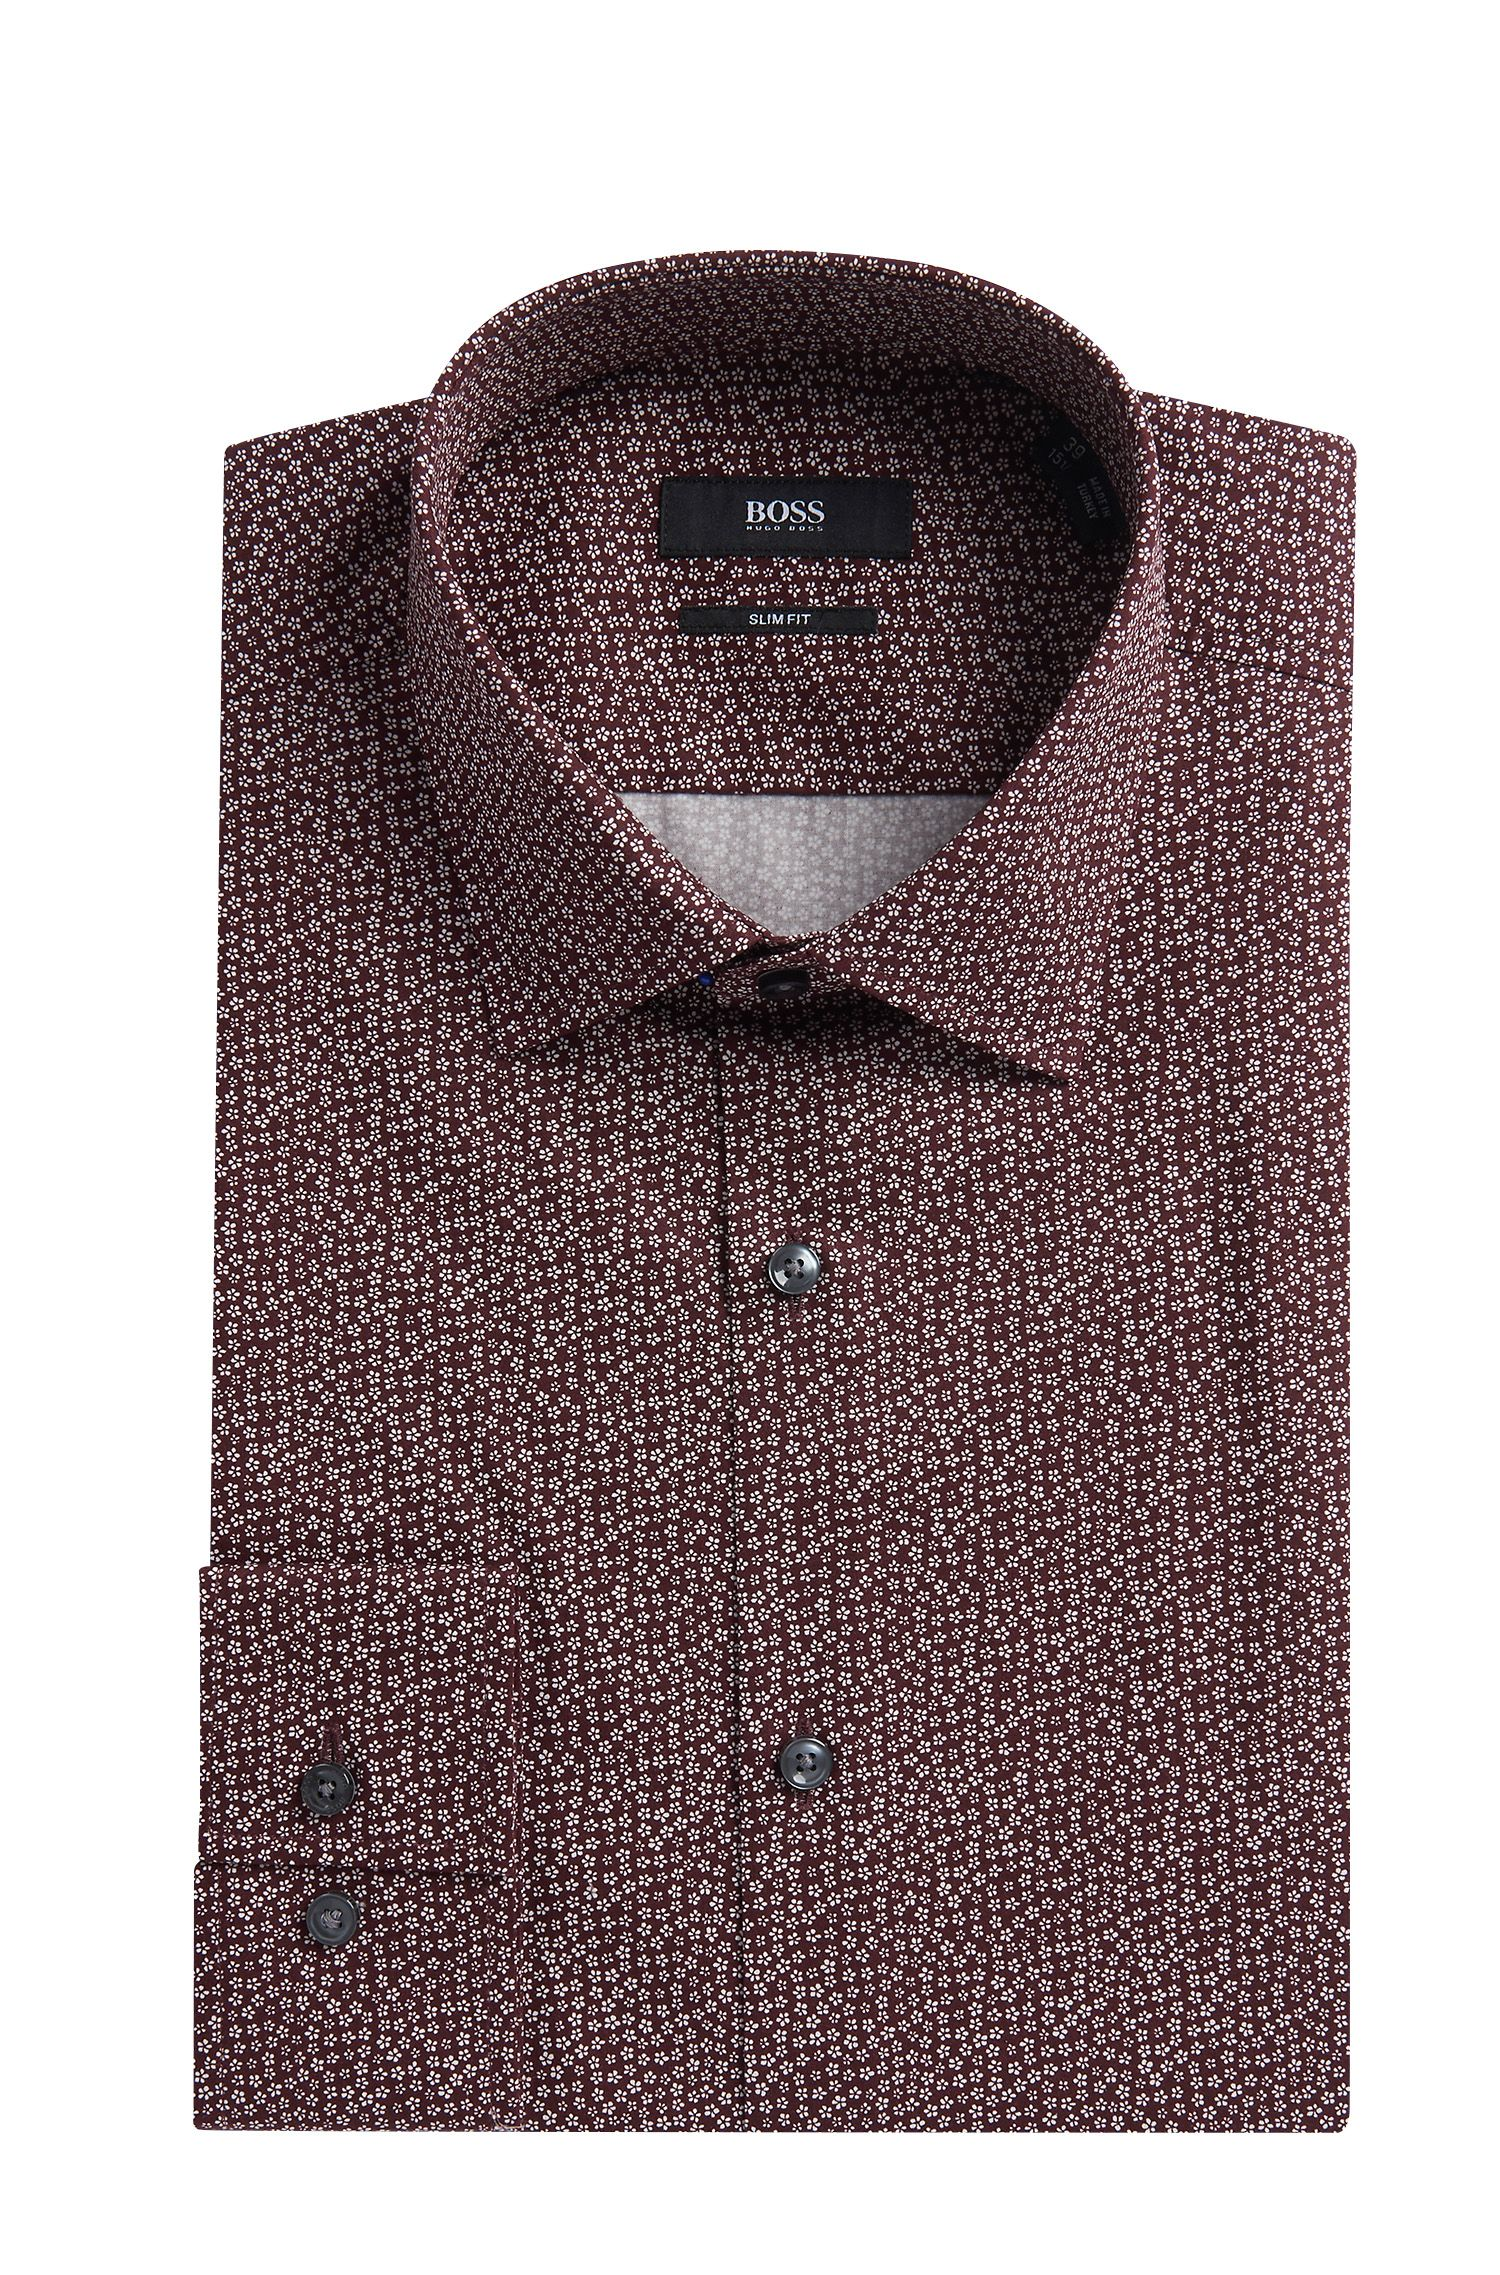 Flower-Print Cotton Dress Shirt, Slim Fit   Jenno